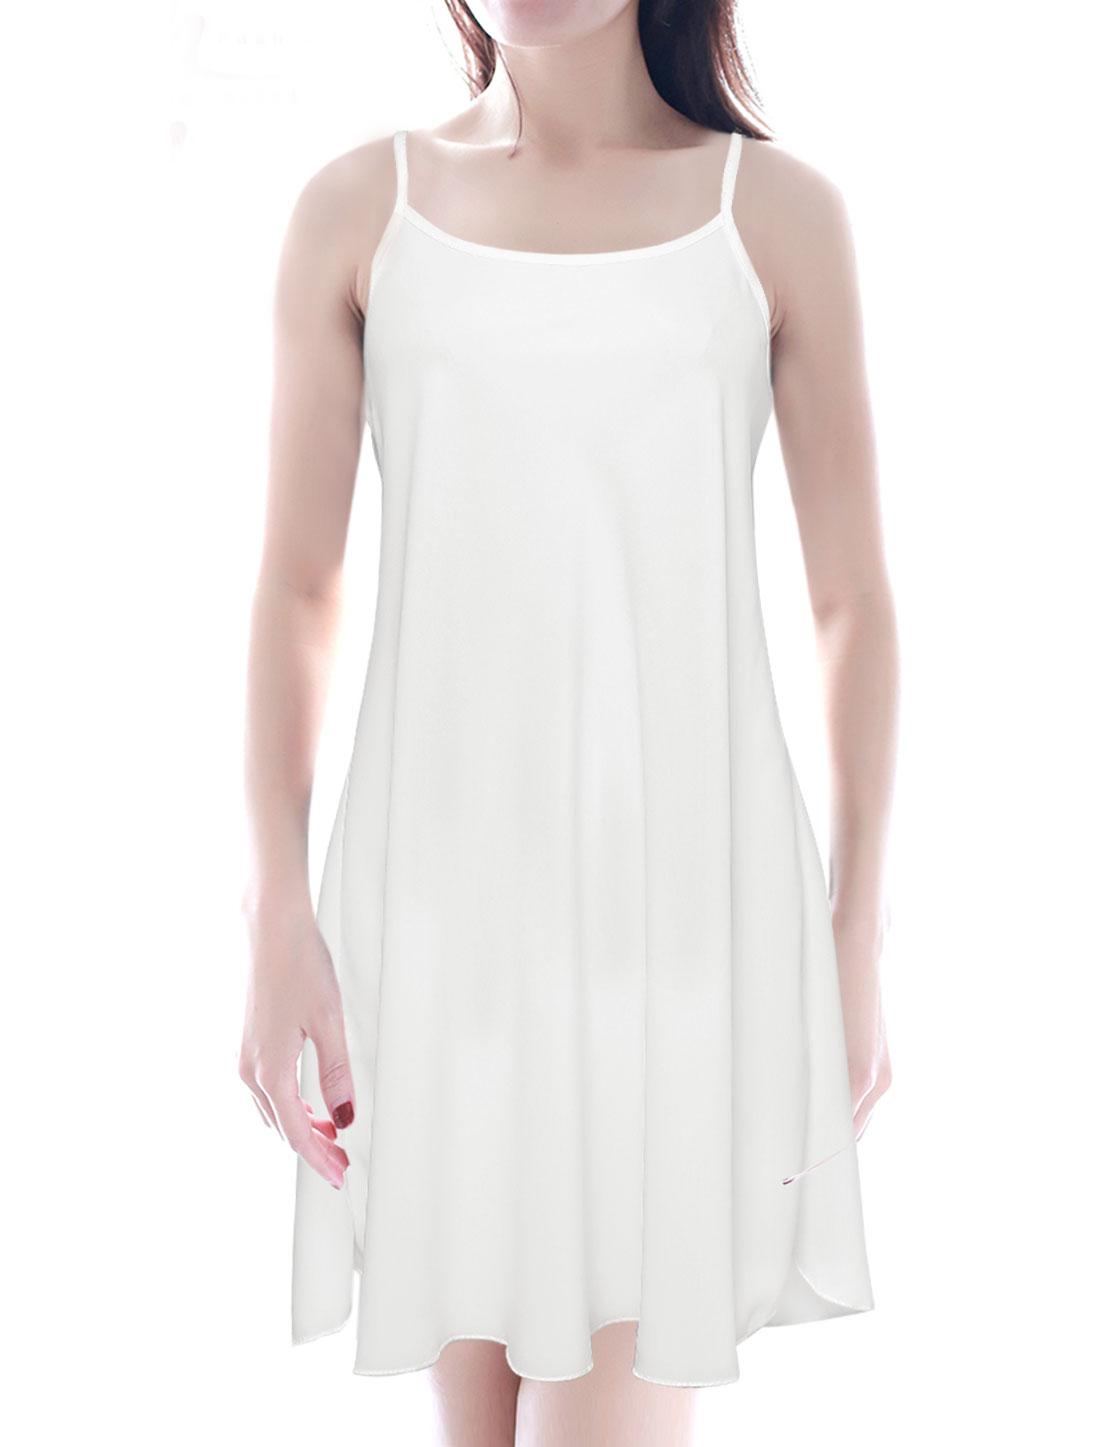 Ladies Spaghetti Strap U Neck Loose Fit Casual Dresses White S